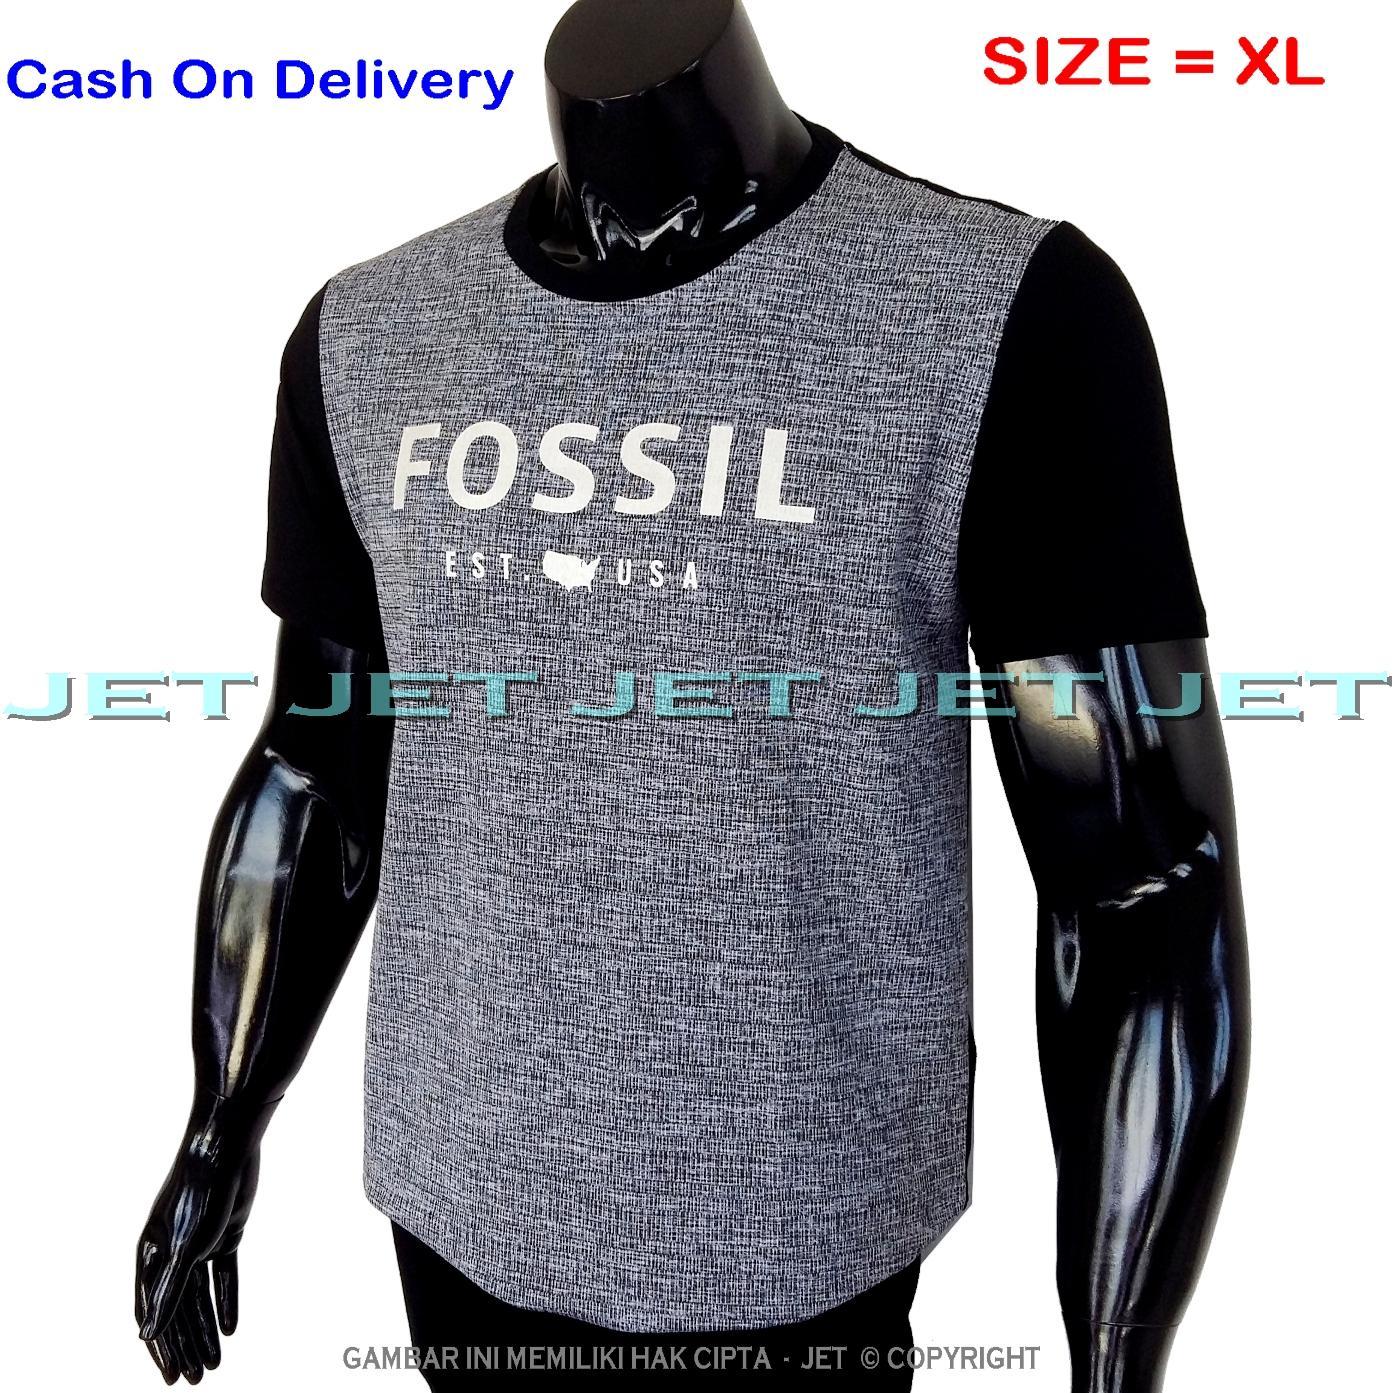 JeT - Kaos Distro FOSSIL Size XL Dewasa Lengan Pendek Soft Rayon Viscose Lycra Tidak Pasaran Sablon